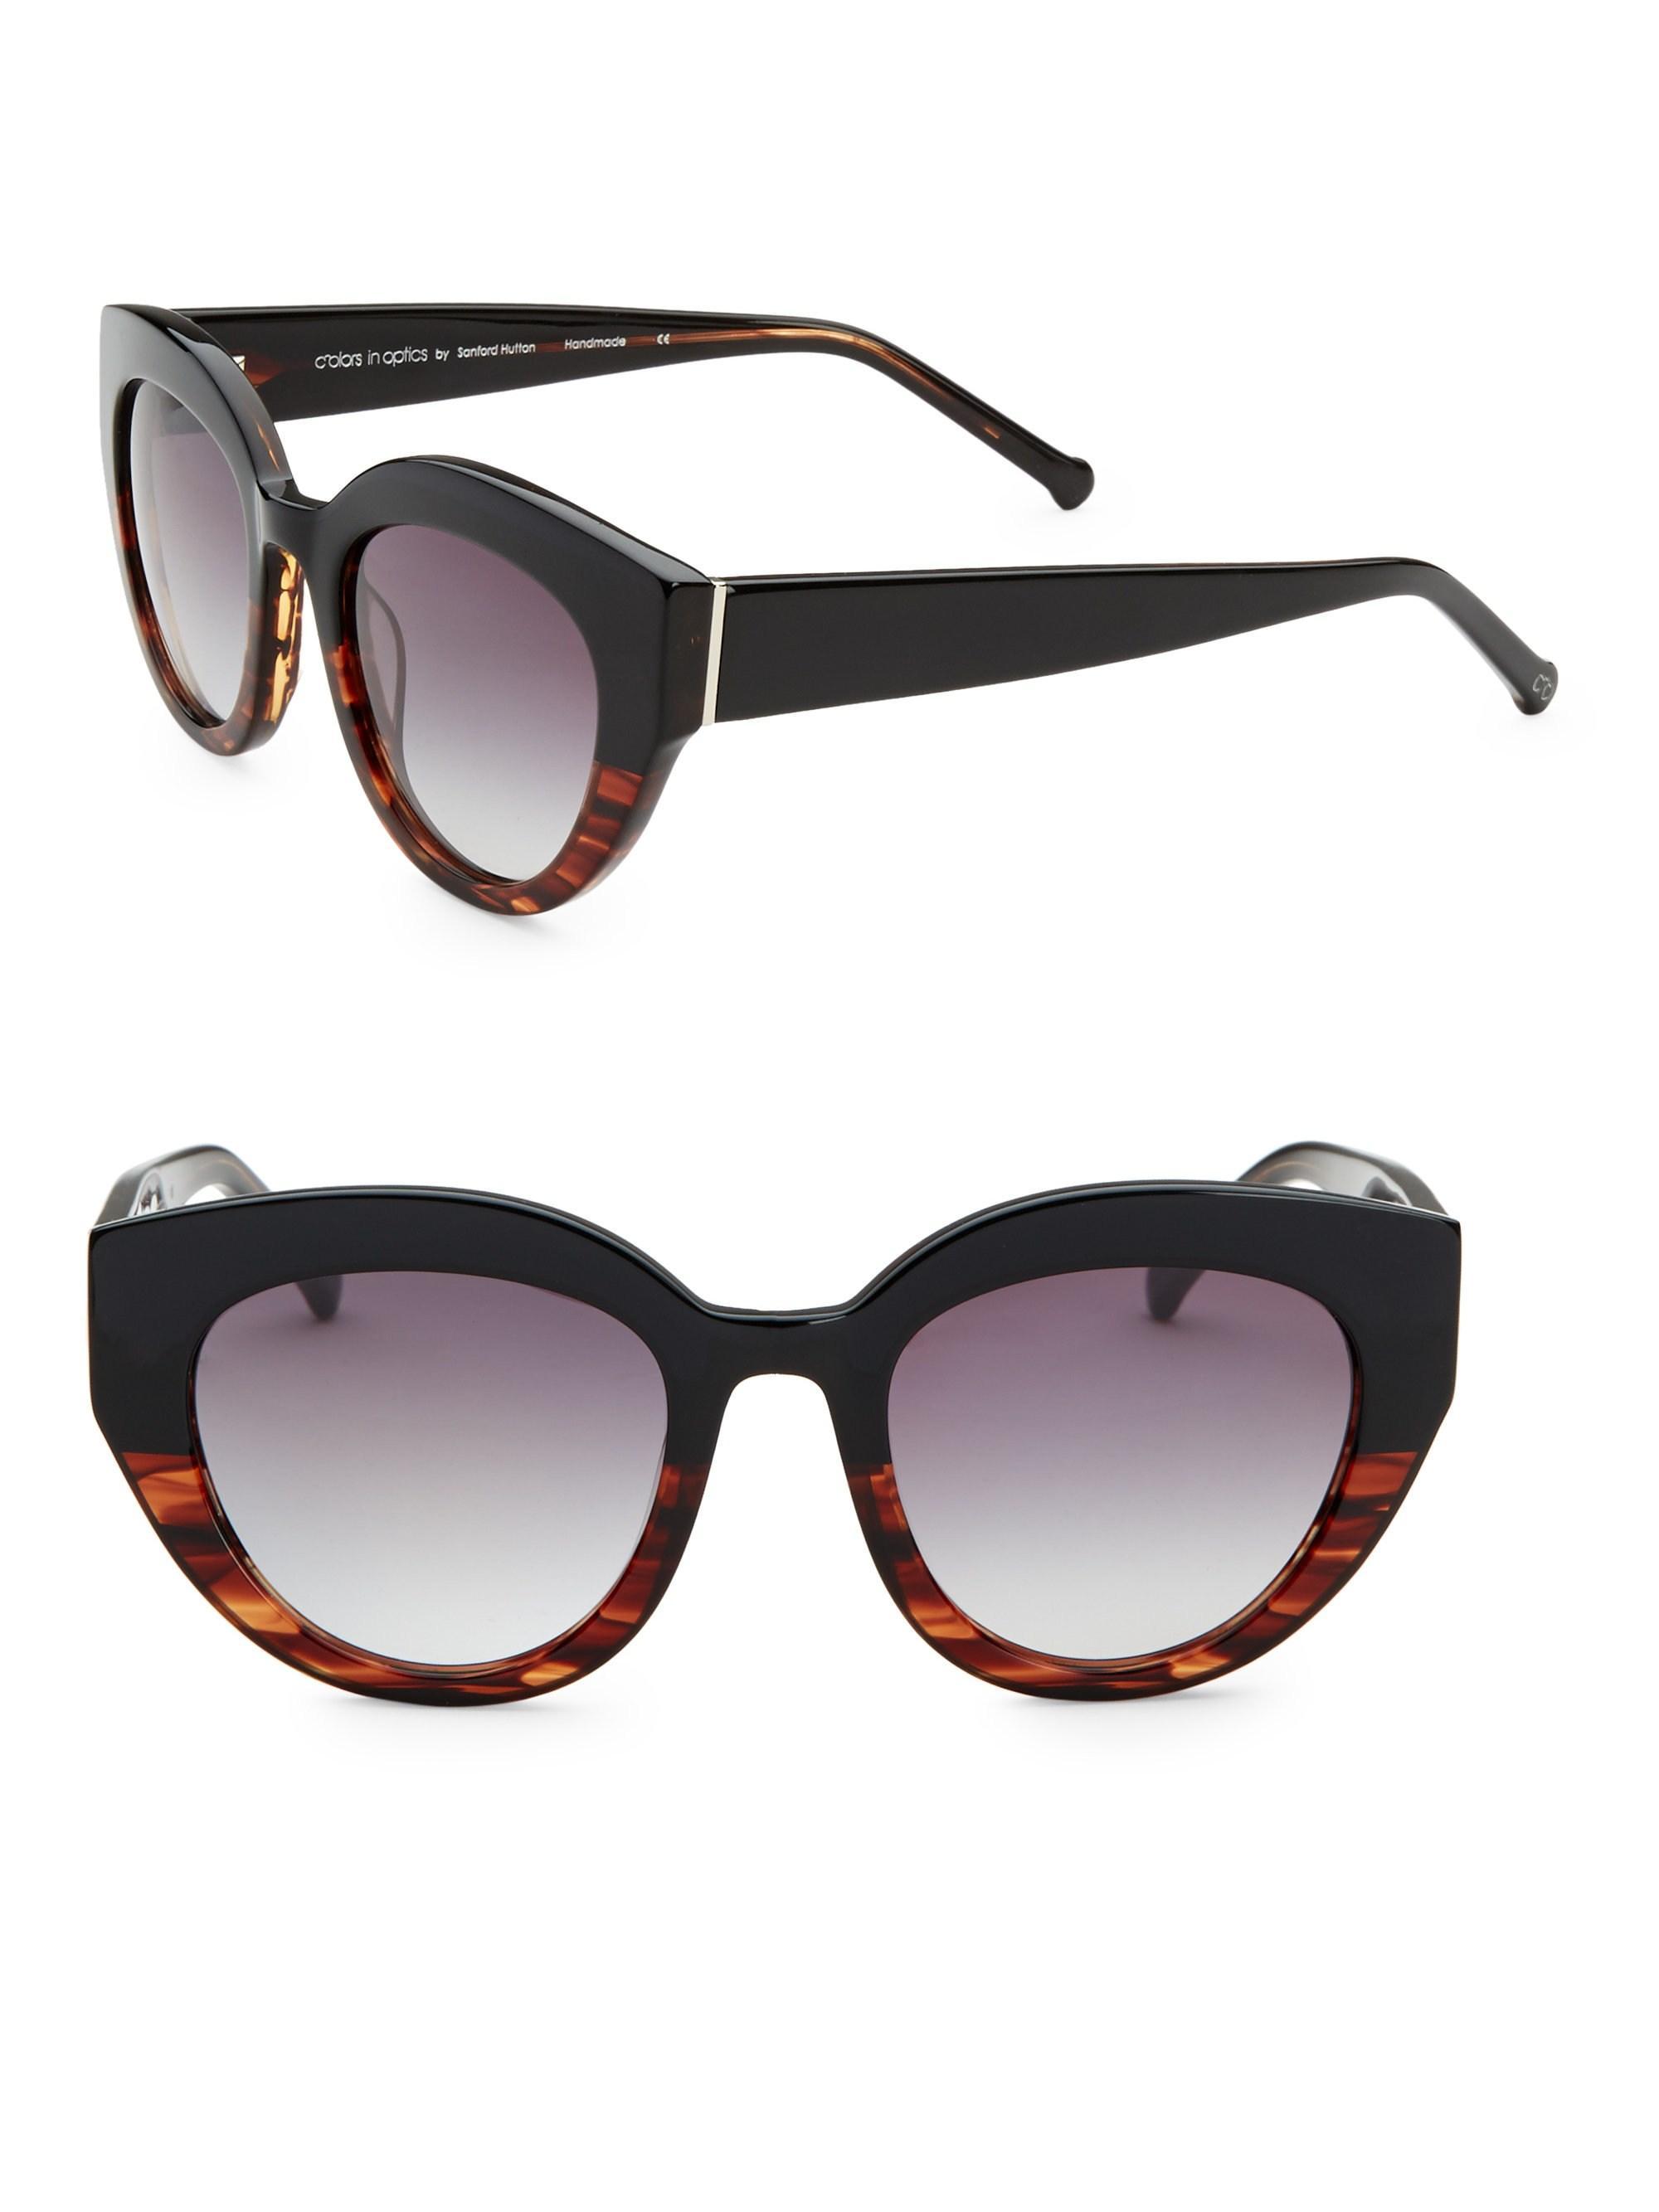 4966bb08486 Lyst - Colors In Optics Women s Carnavale Thick Plastic Cat Eye ...